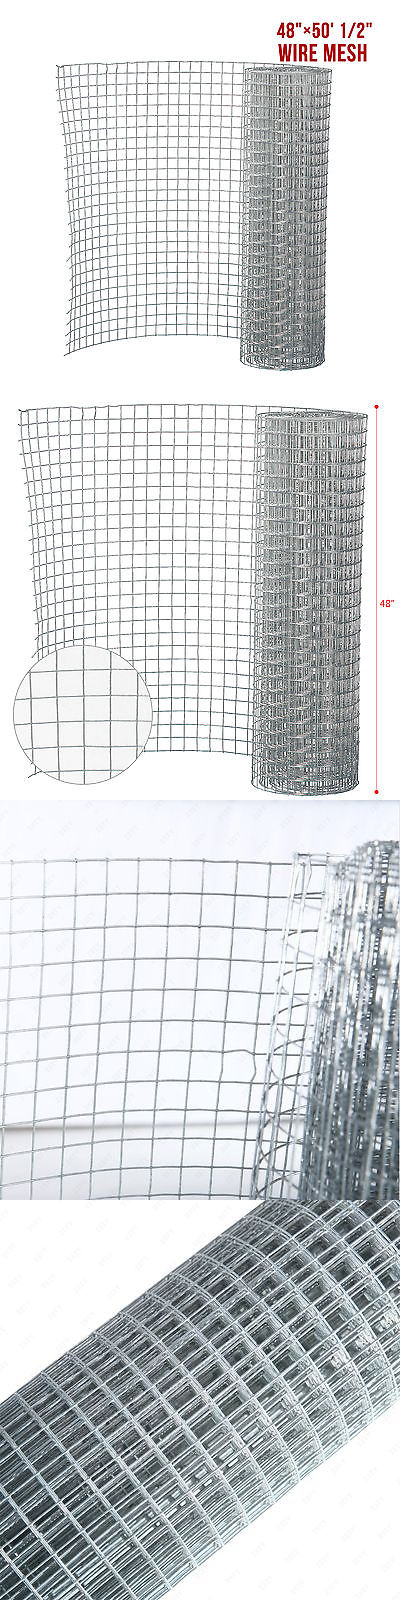 Galvanized Wire Mesh Hardware Cloth - Dolgular.com